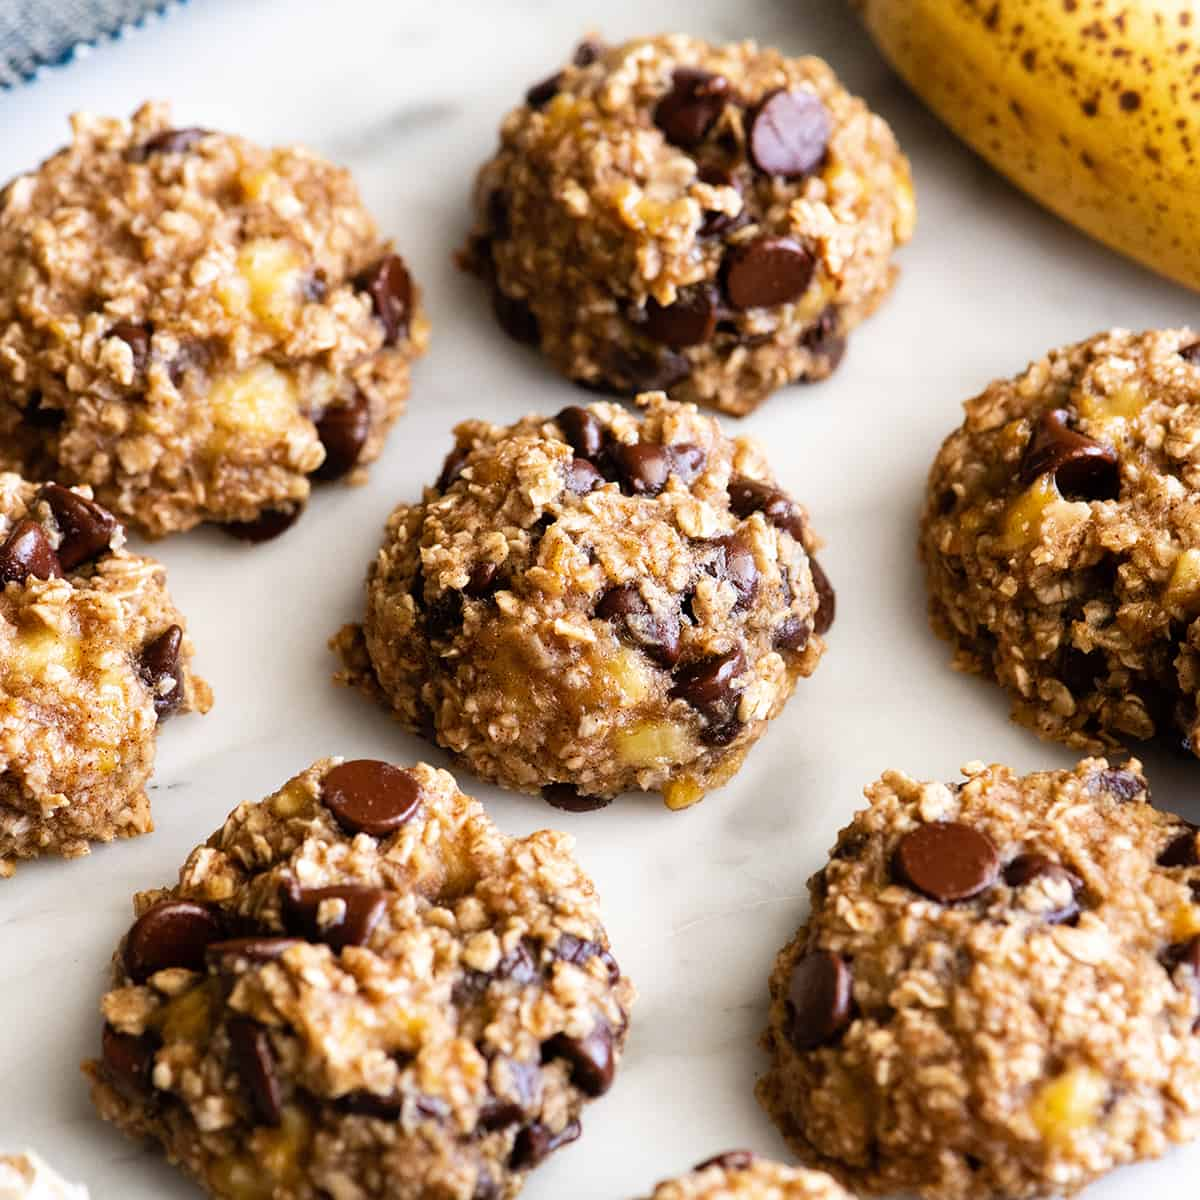 6 Banana Oatmeal Cookies